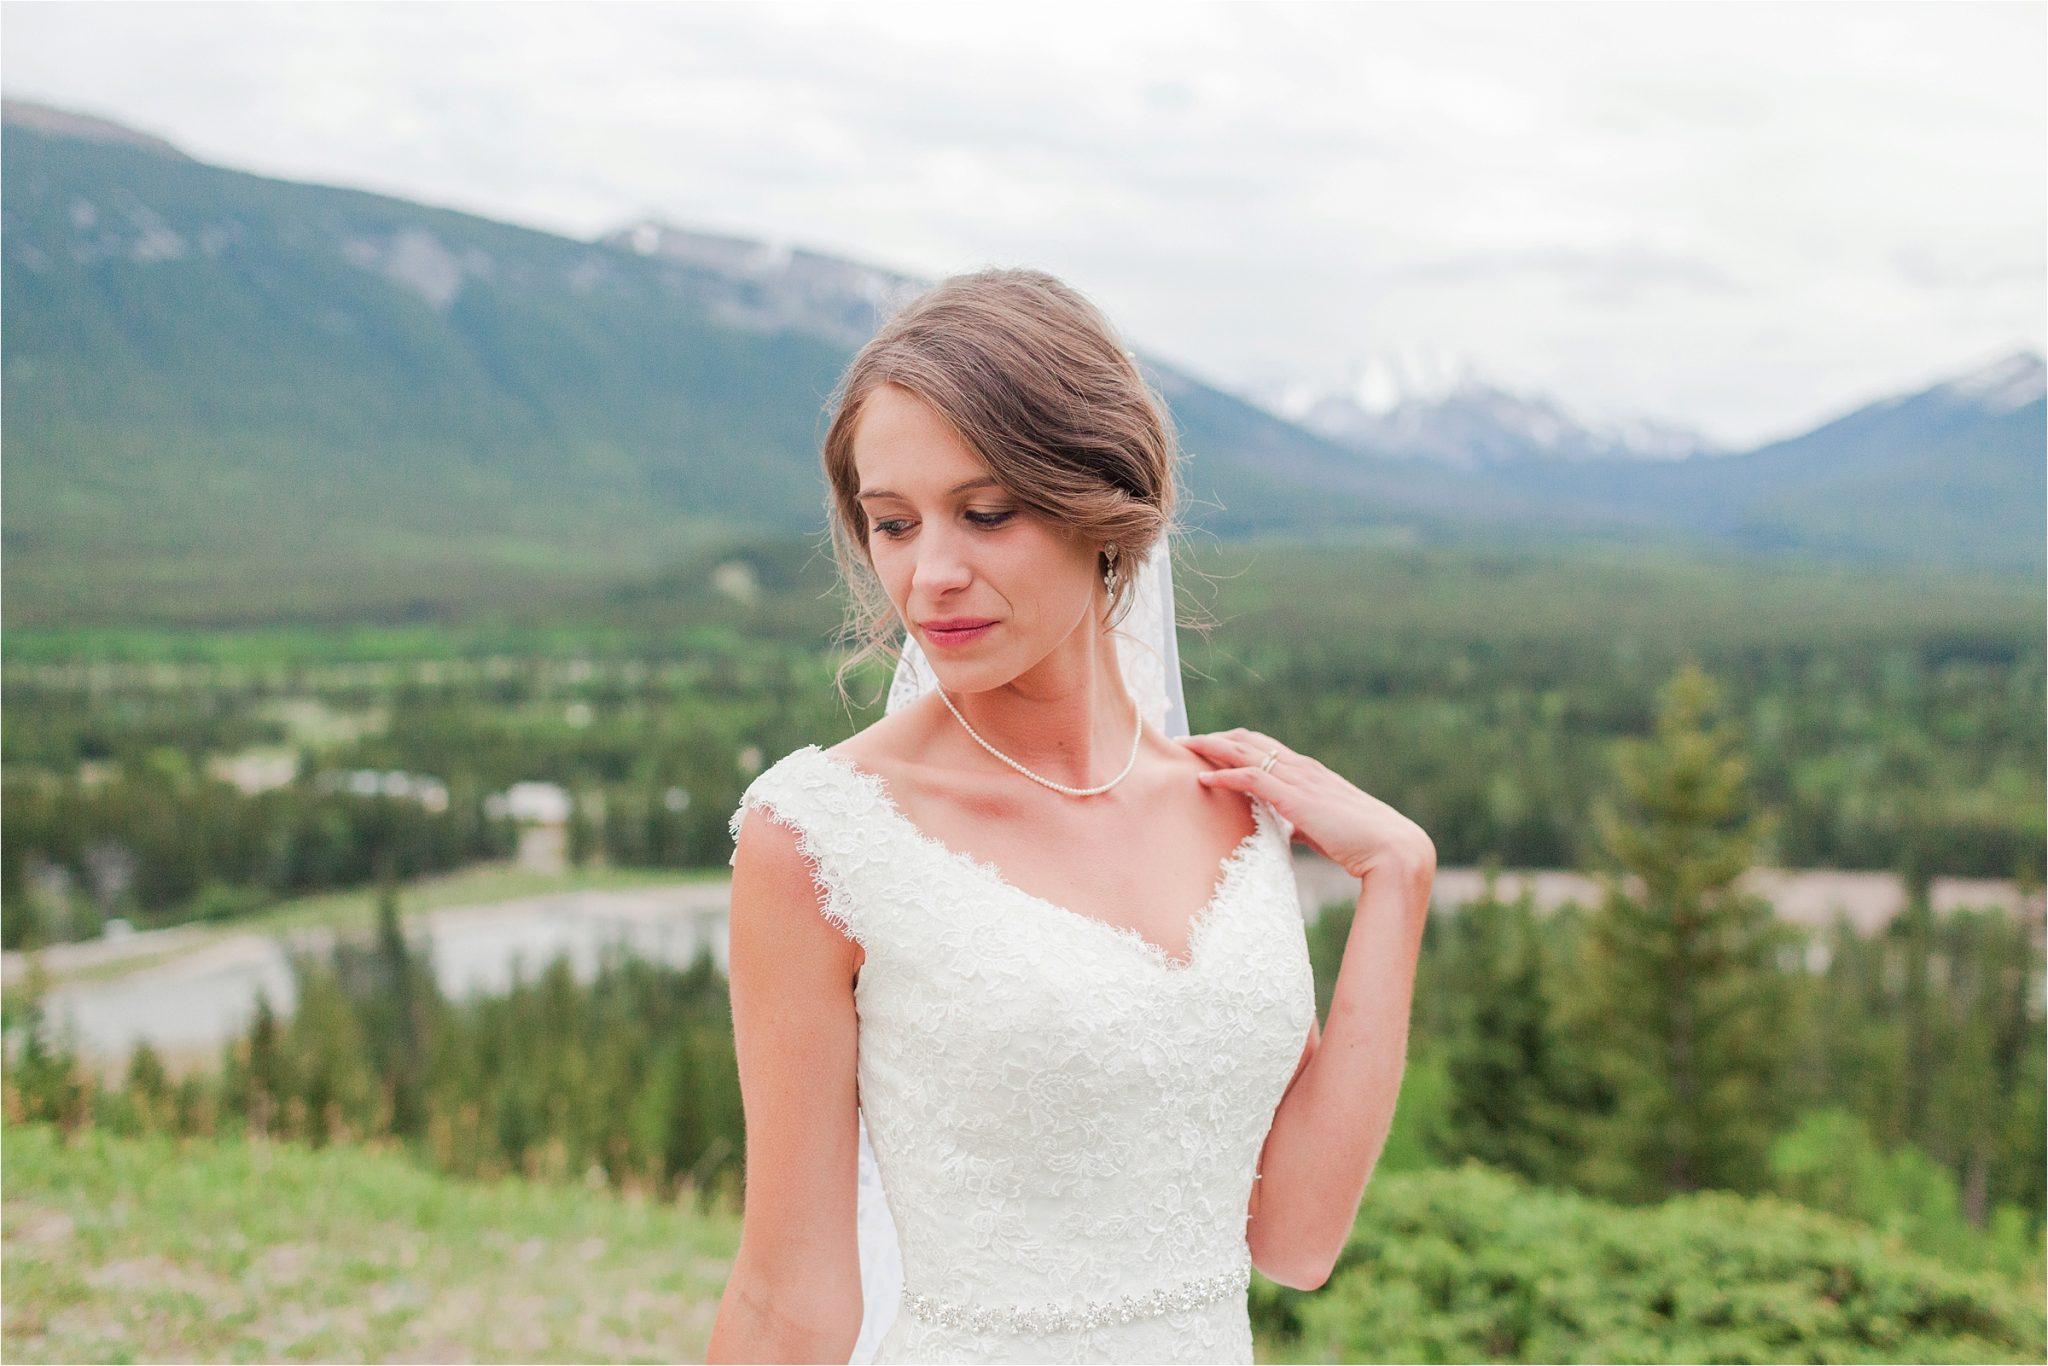 Bridal portraits Kananaskis Canada Wedding at the Delta Lodge